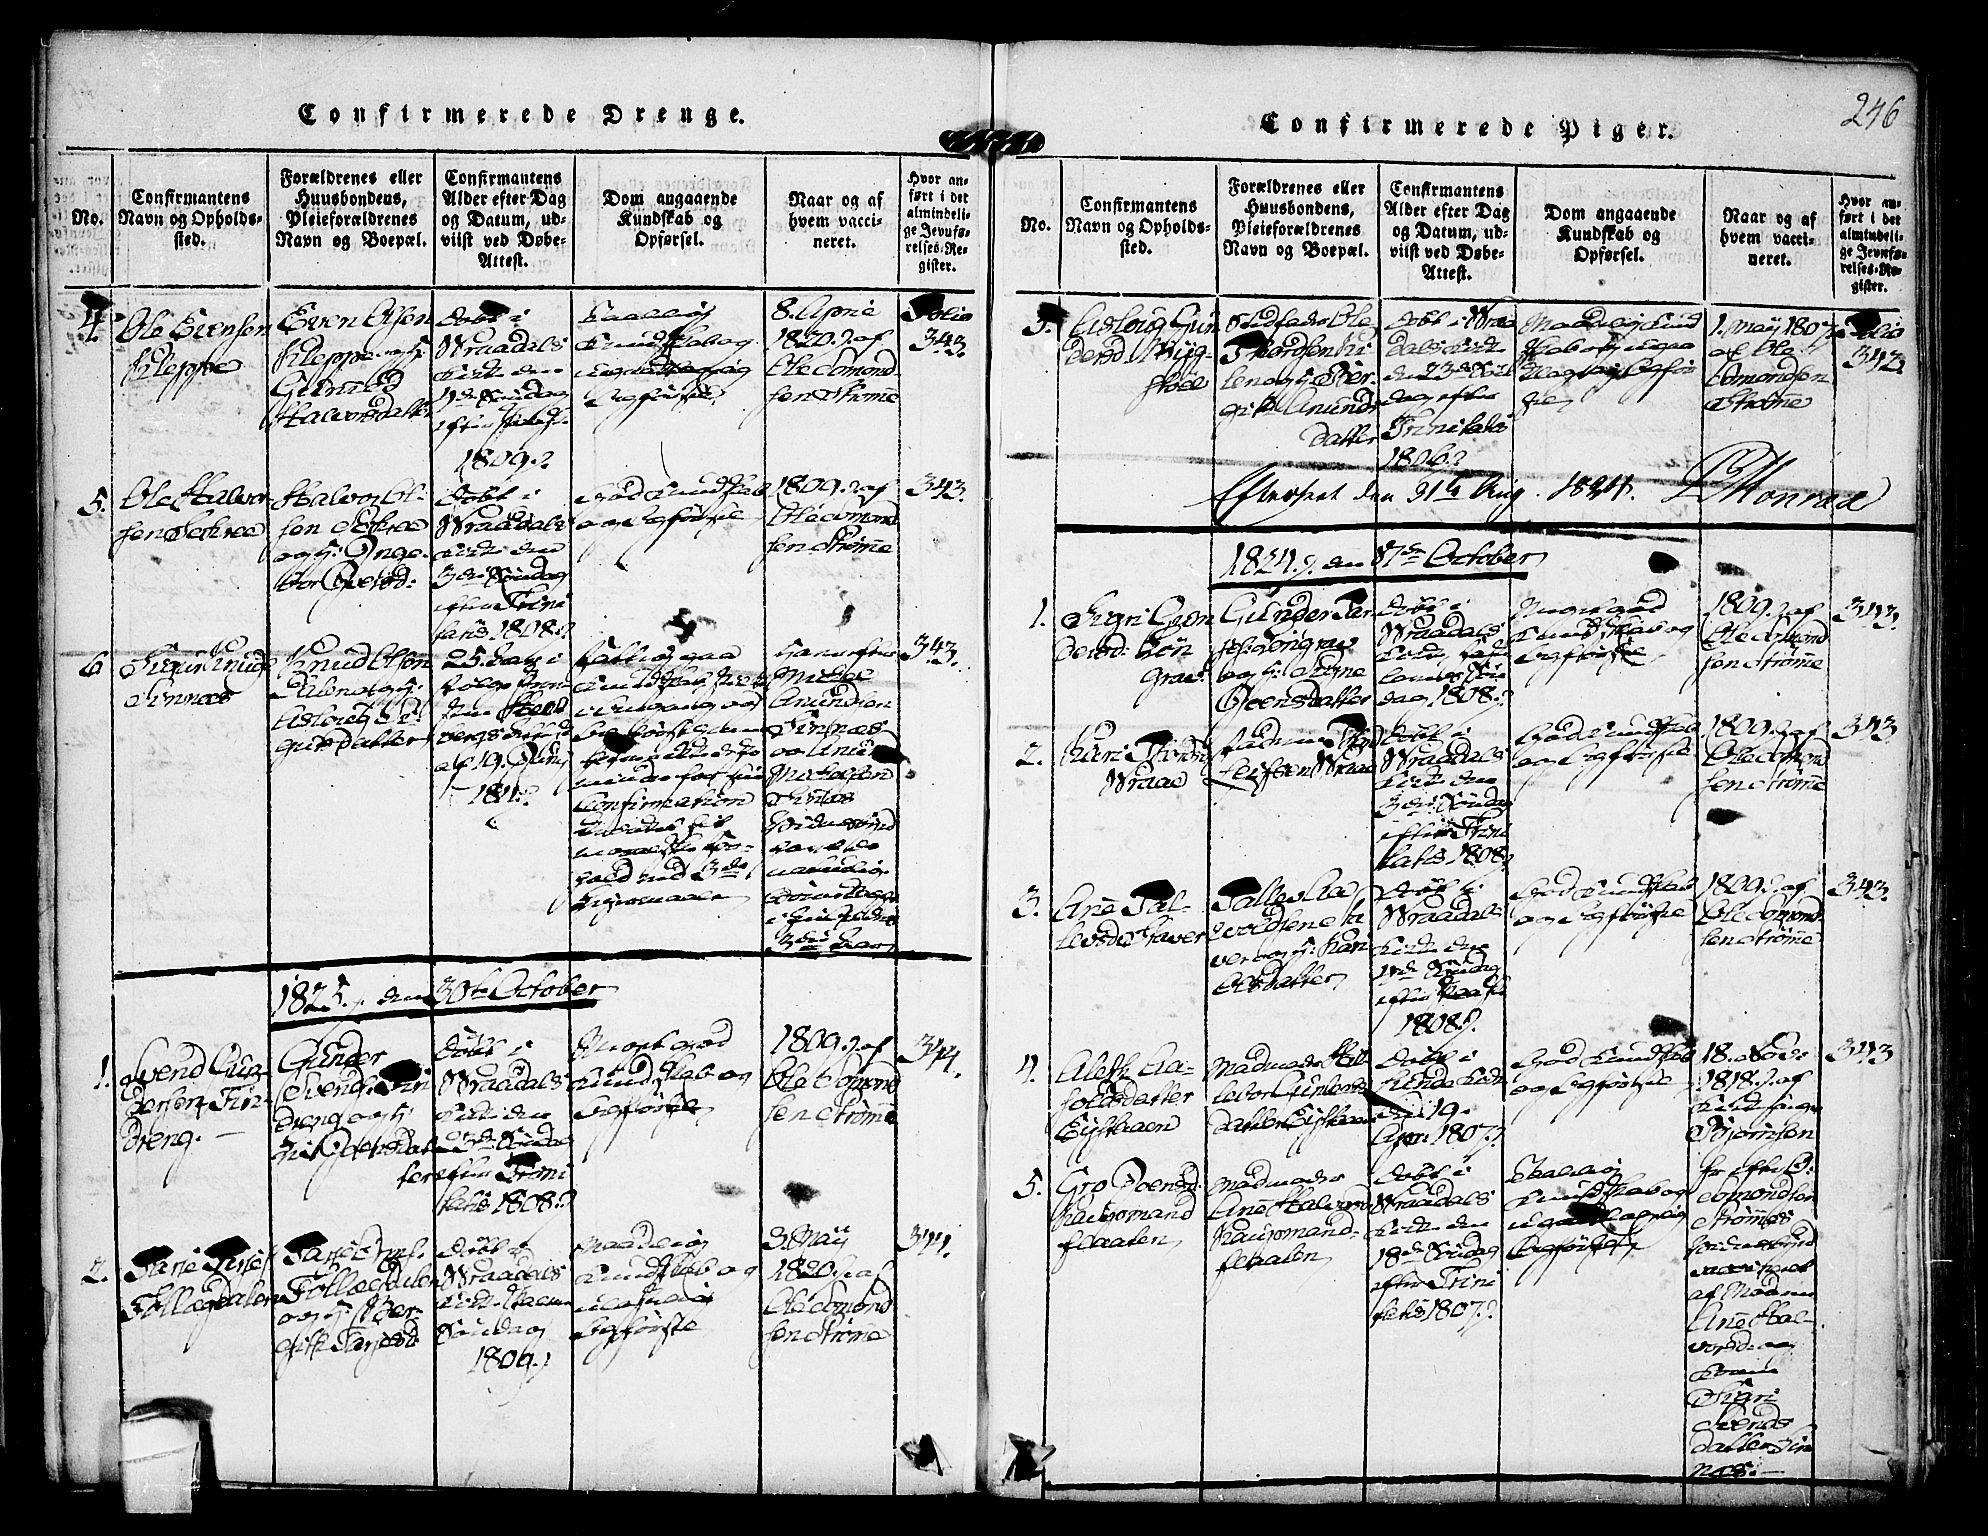 SAKO, Kviteseid kirkebøker, F/Fc/L0001: Ministerialbok nr. III 1, 1815-1836, s. 246